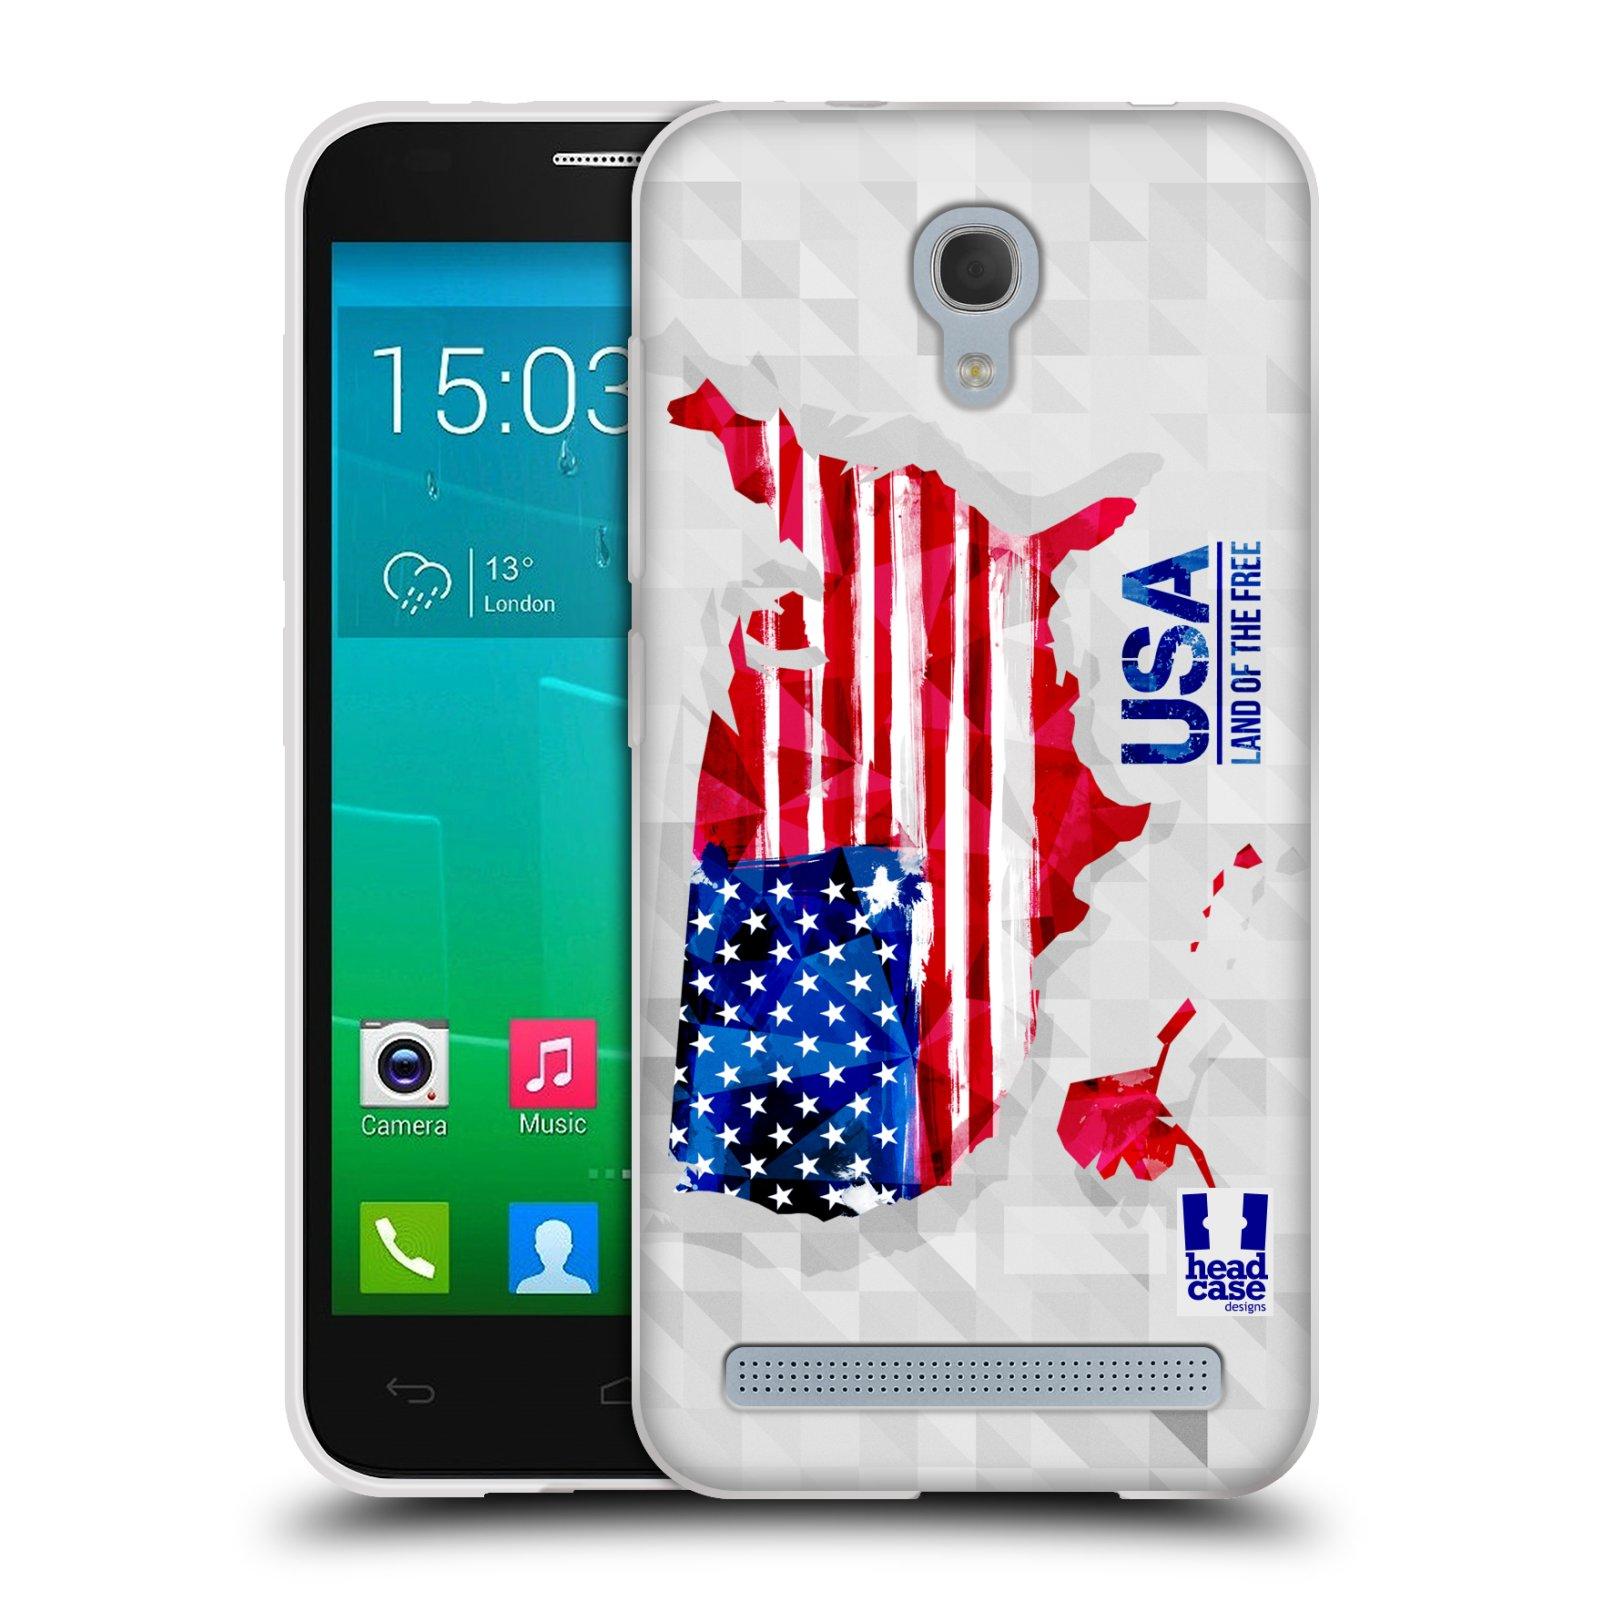 Silikonové pouzdro na mobil Alcatel One Touch Idol 2 Mini S 6036Y HEAD CASE GEOMAPA USA (Silikonový kryt či obal na mobilní telefon Alcatel Idol 2 Mini S OT-6036Y)